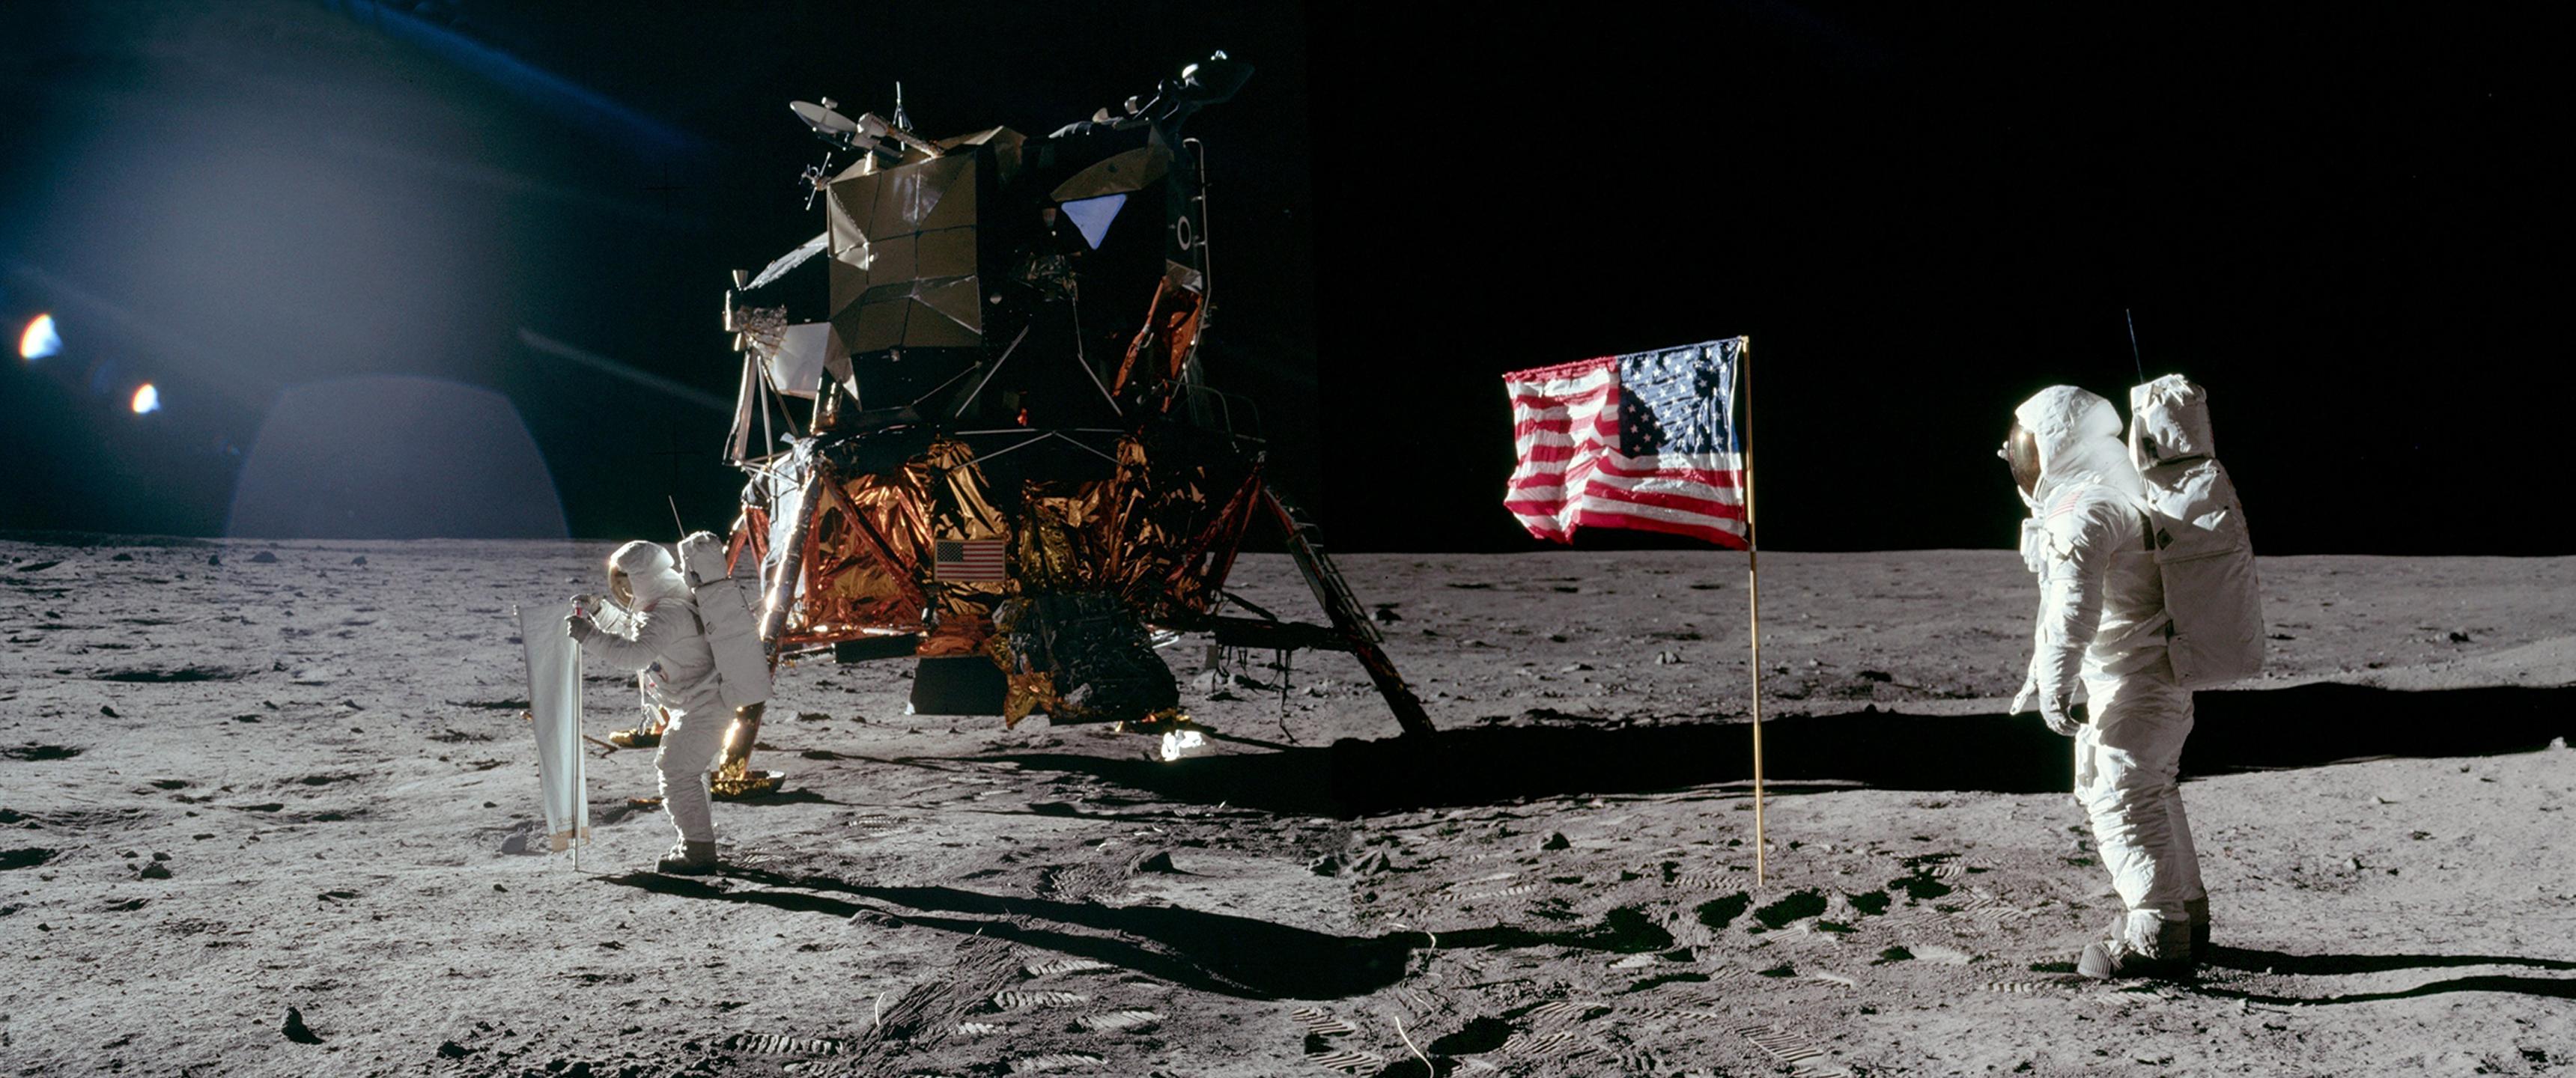 Lunar 3440x1440 17 by StArL0rd84 3440x1440